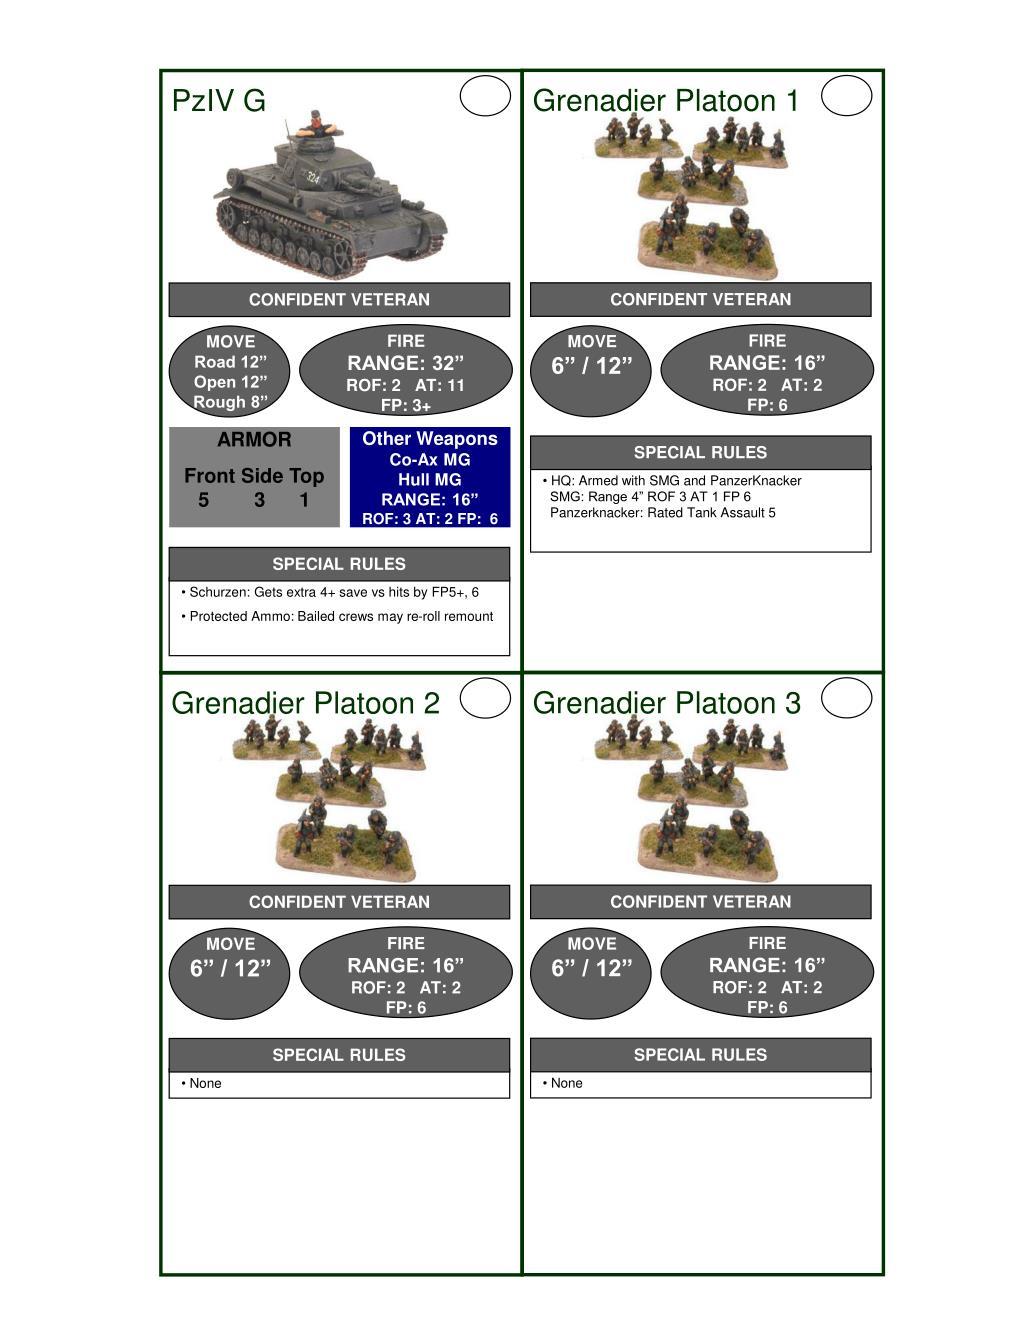 Grenadier Platoon 1